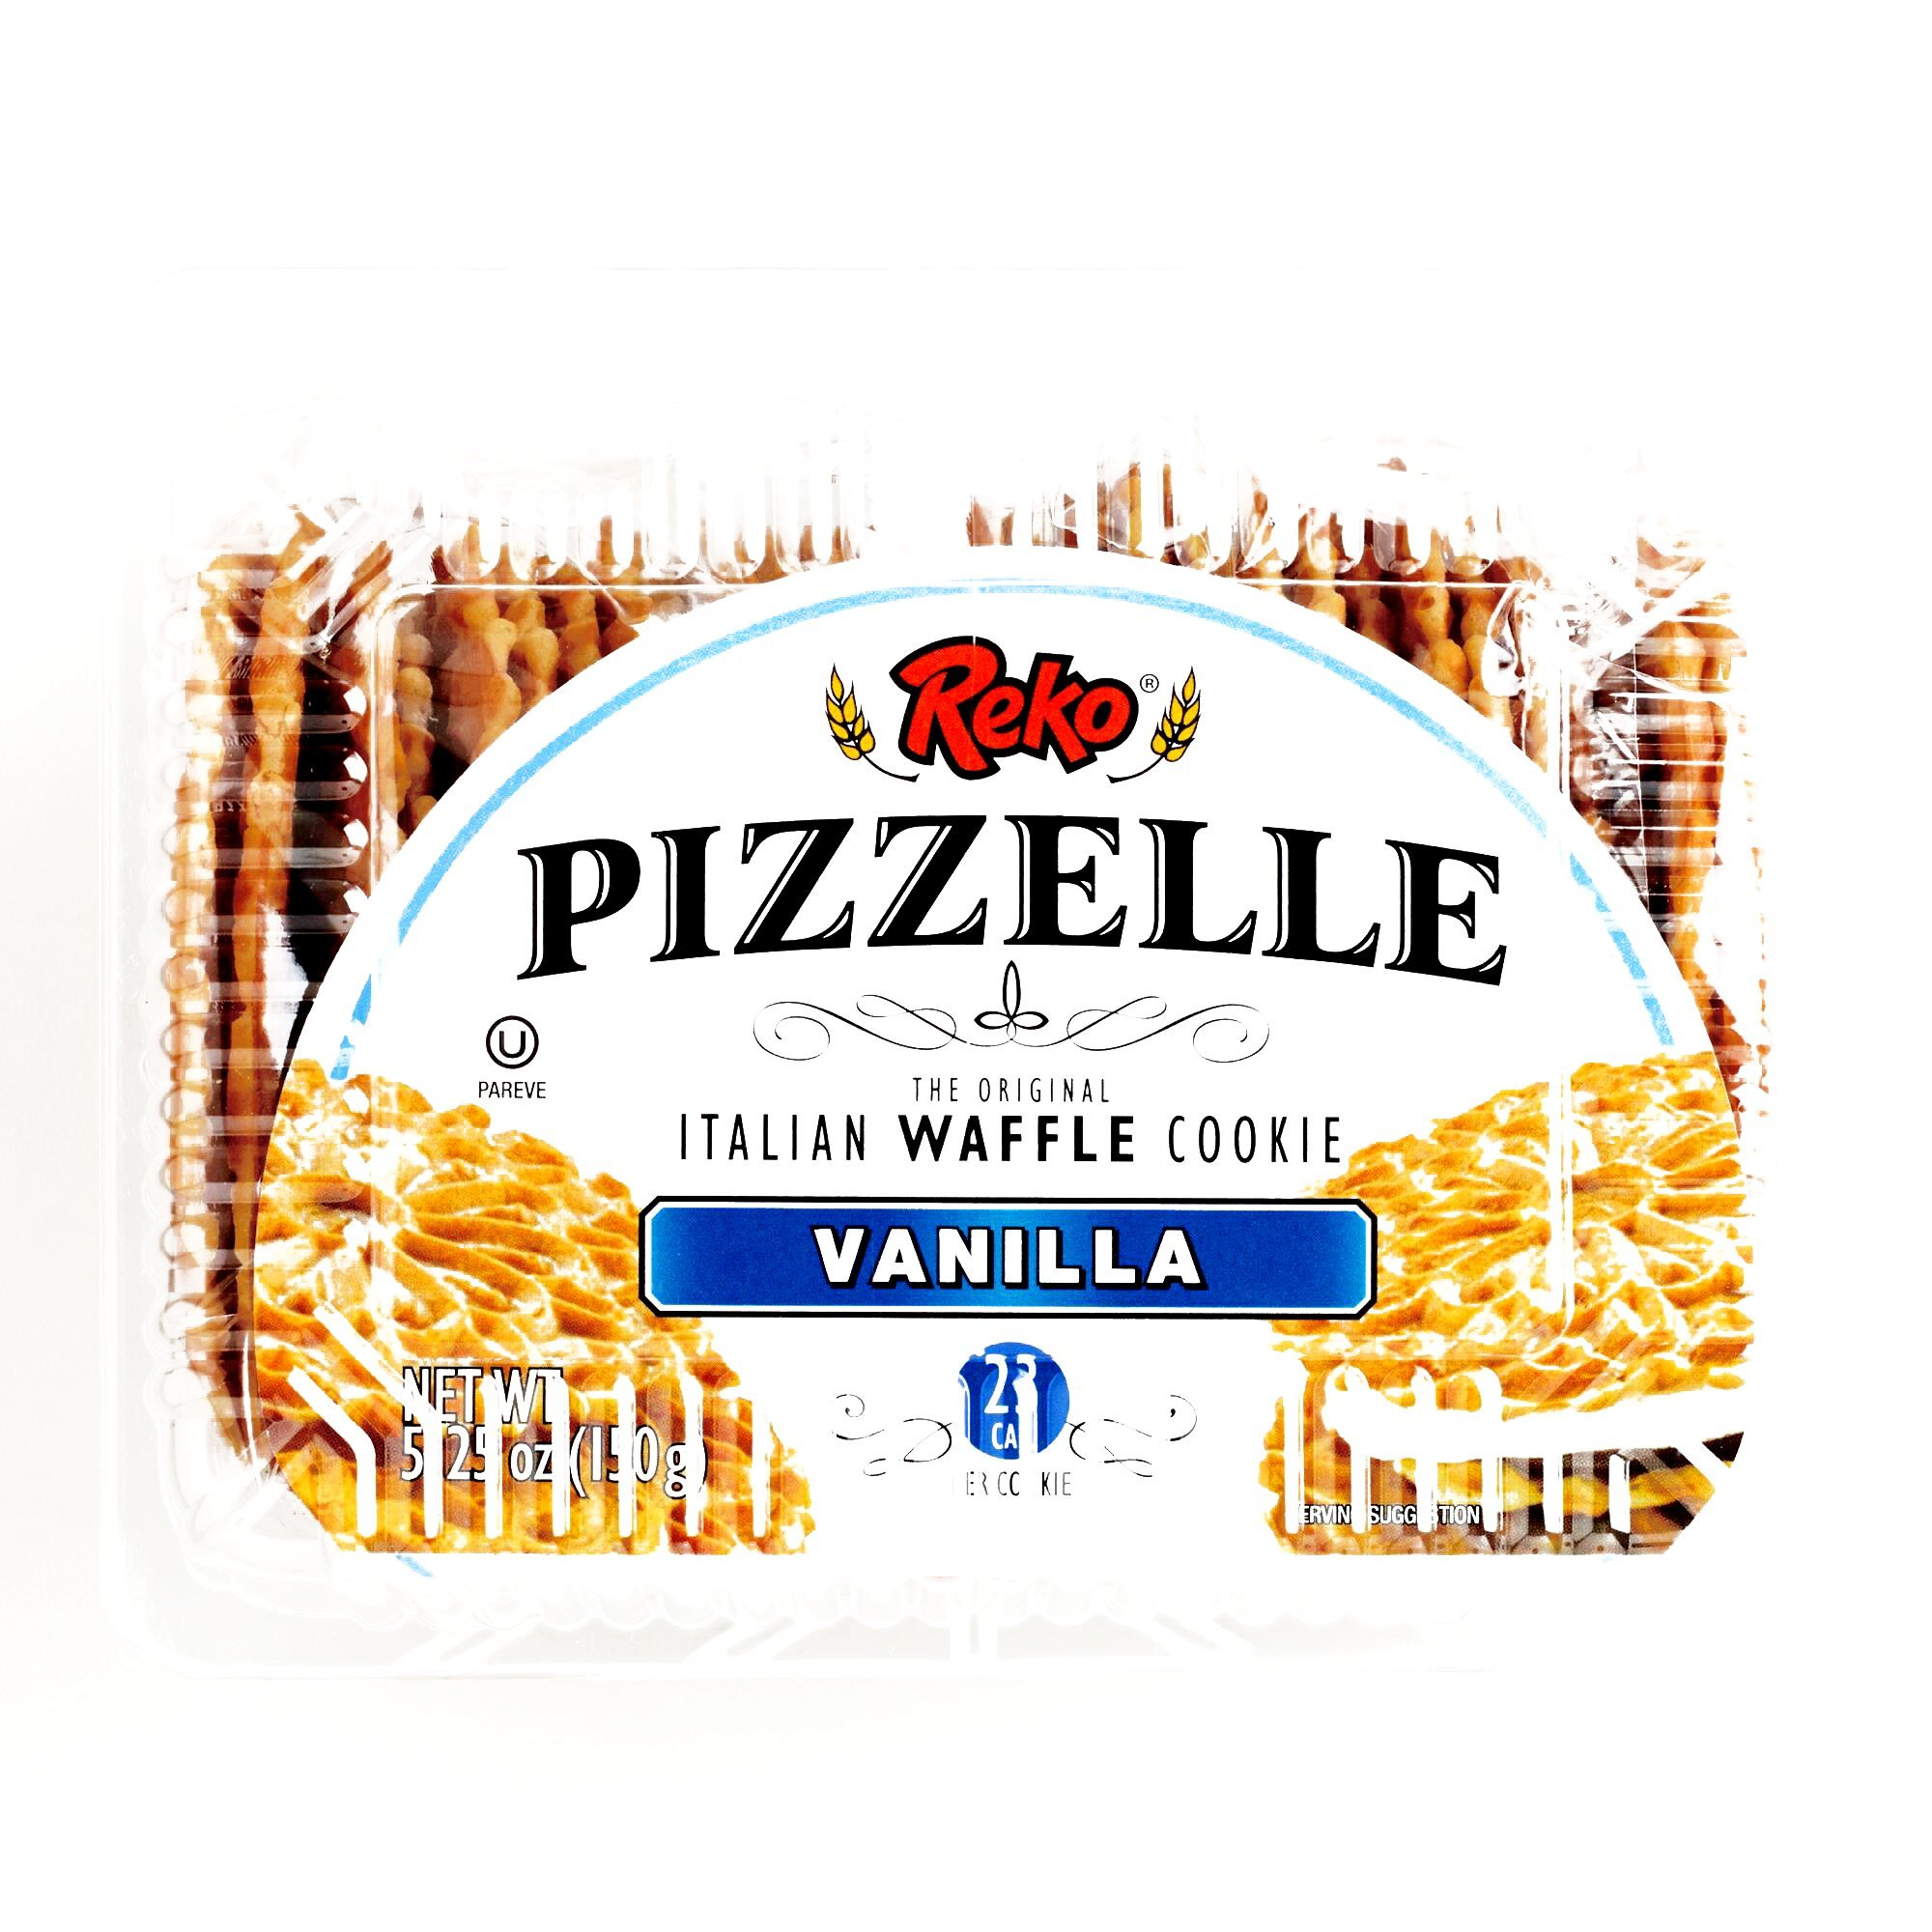 Reko Vanilla Pizzelle Cookies 5.25 oz each (1 Item Per Order)